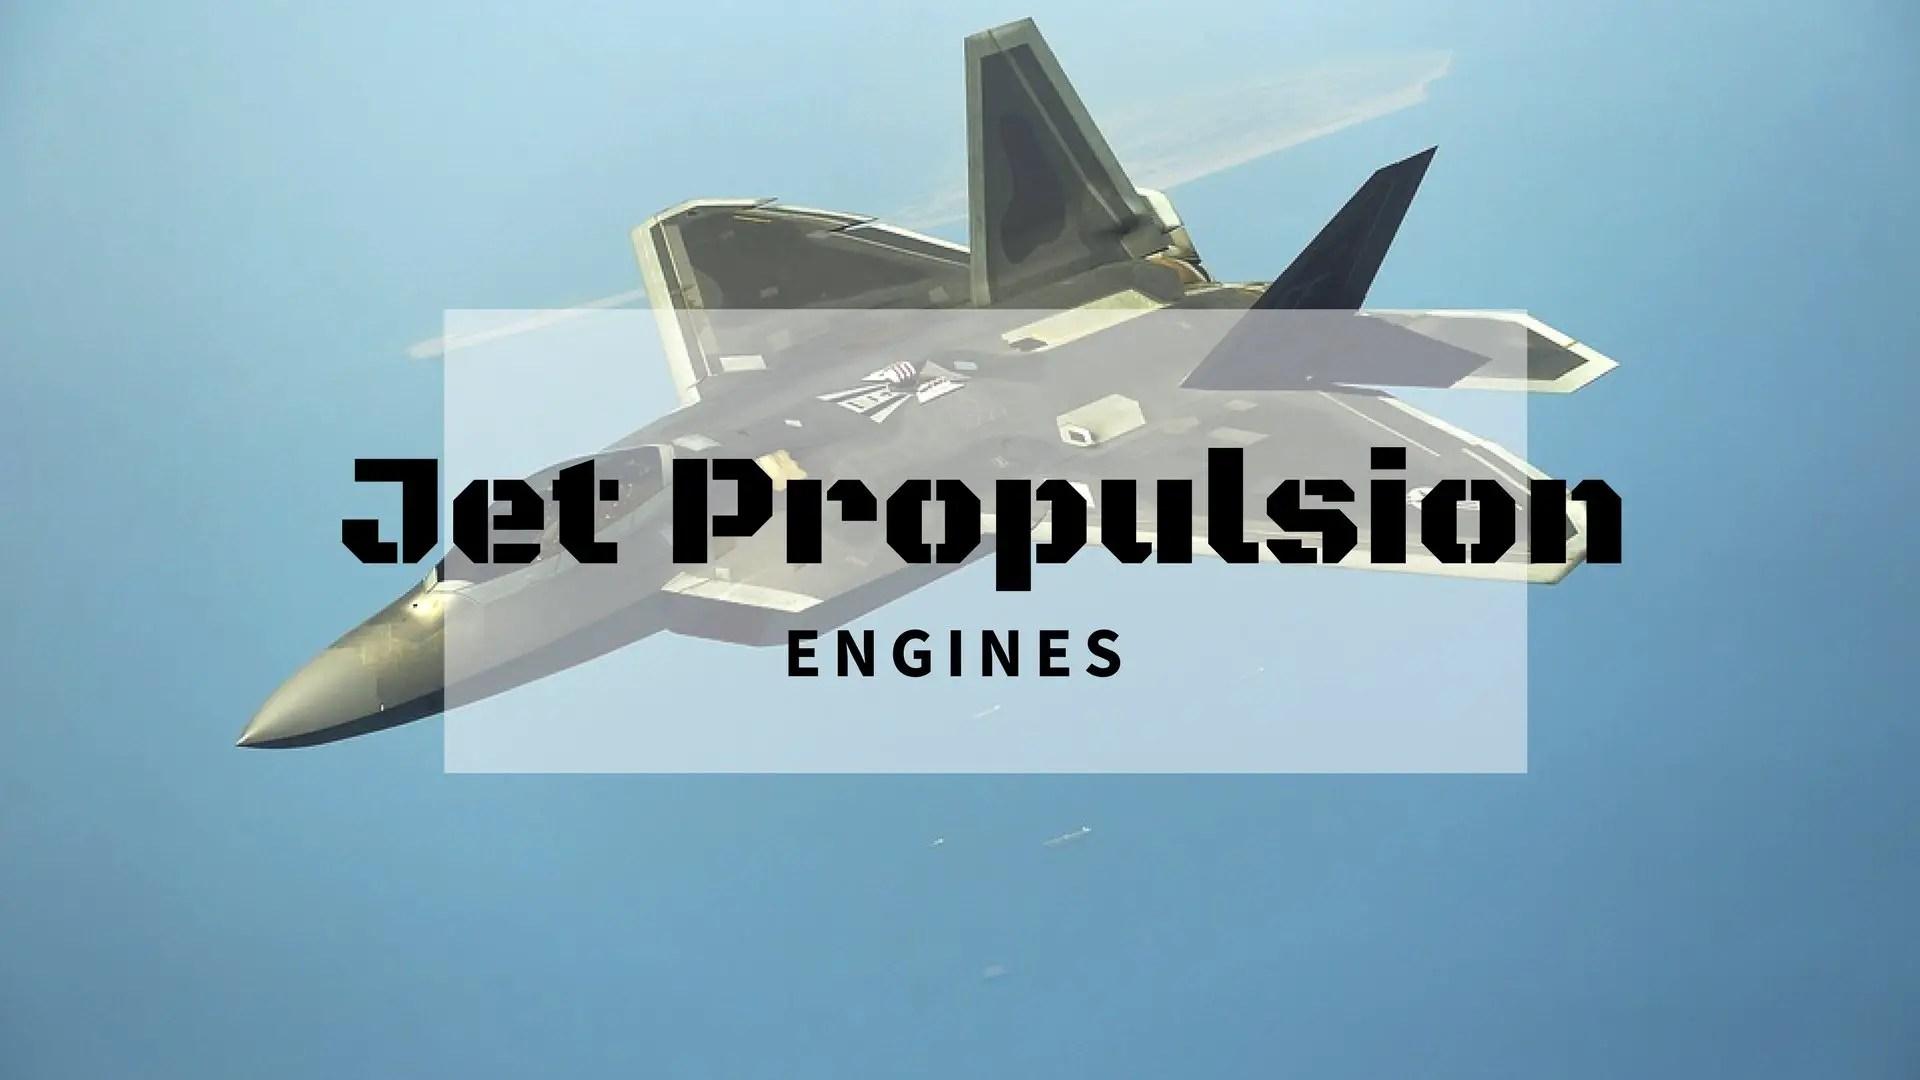 What Is Jet Propulsion Engine L Turbojet Ramjet And Rocket Motor F 22 Raptor Diagram